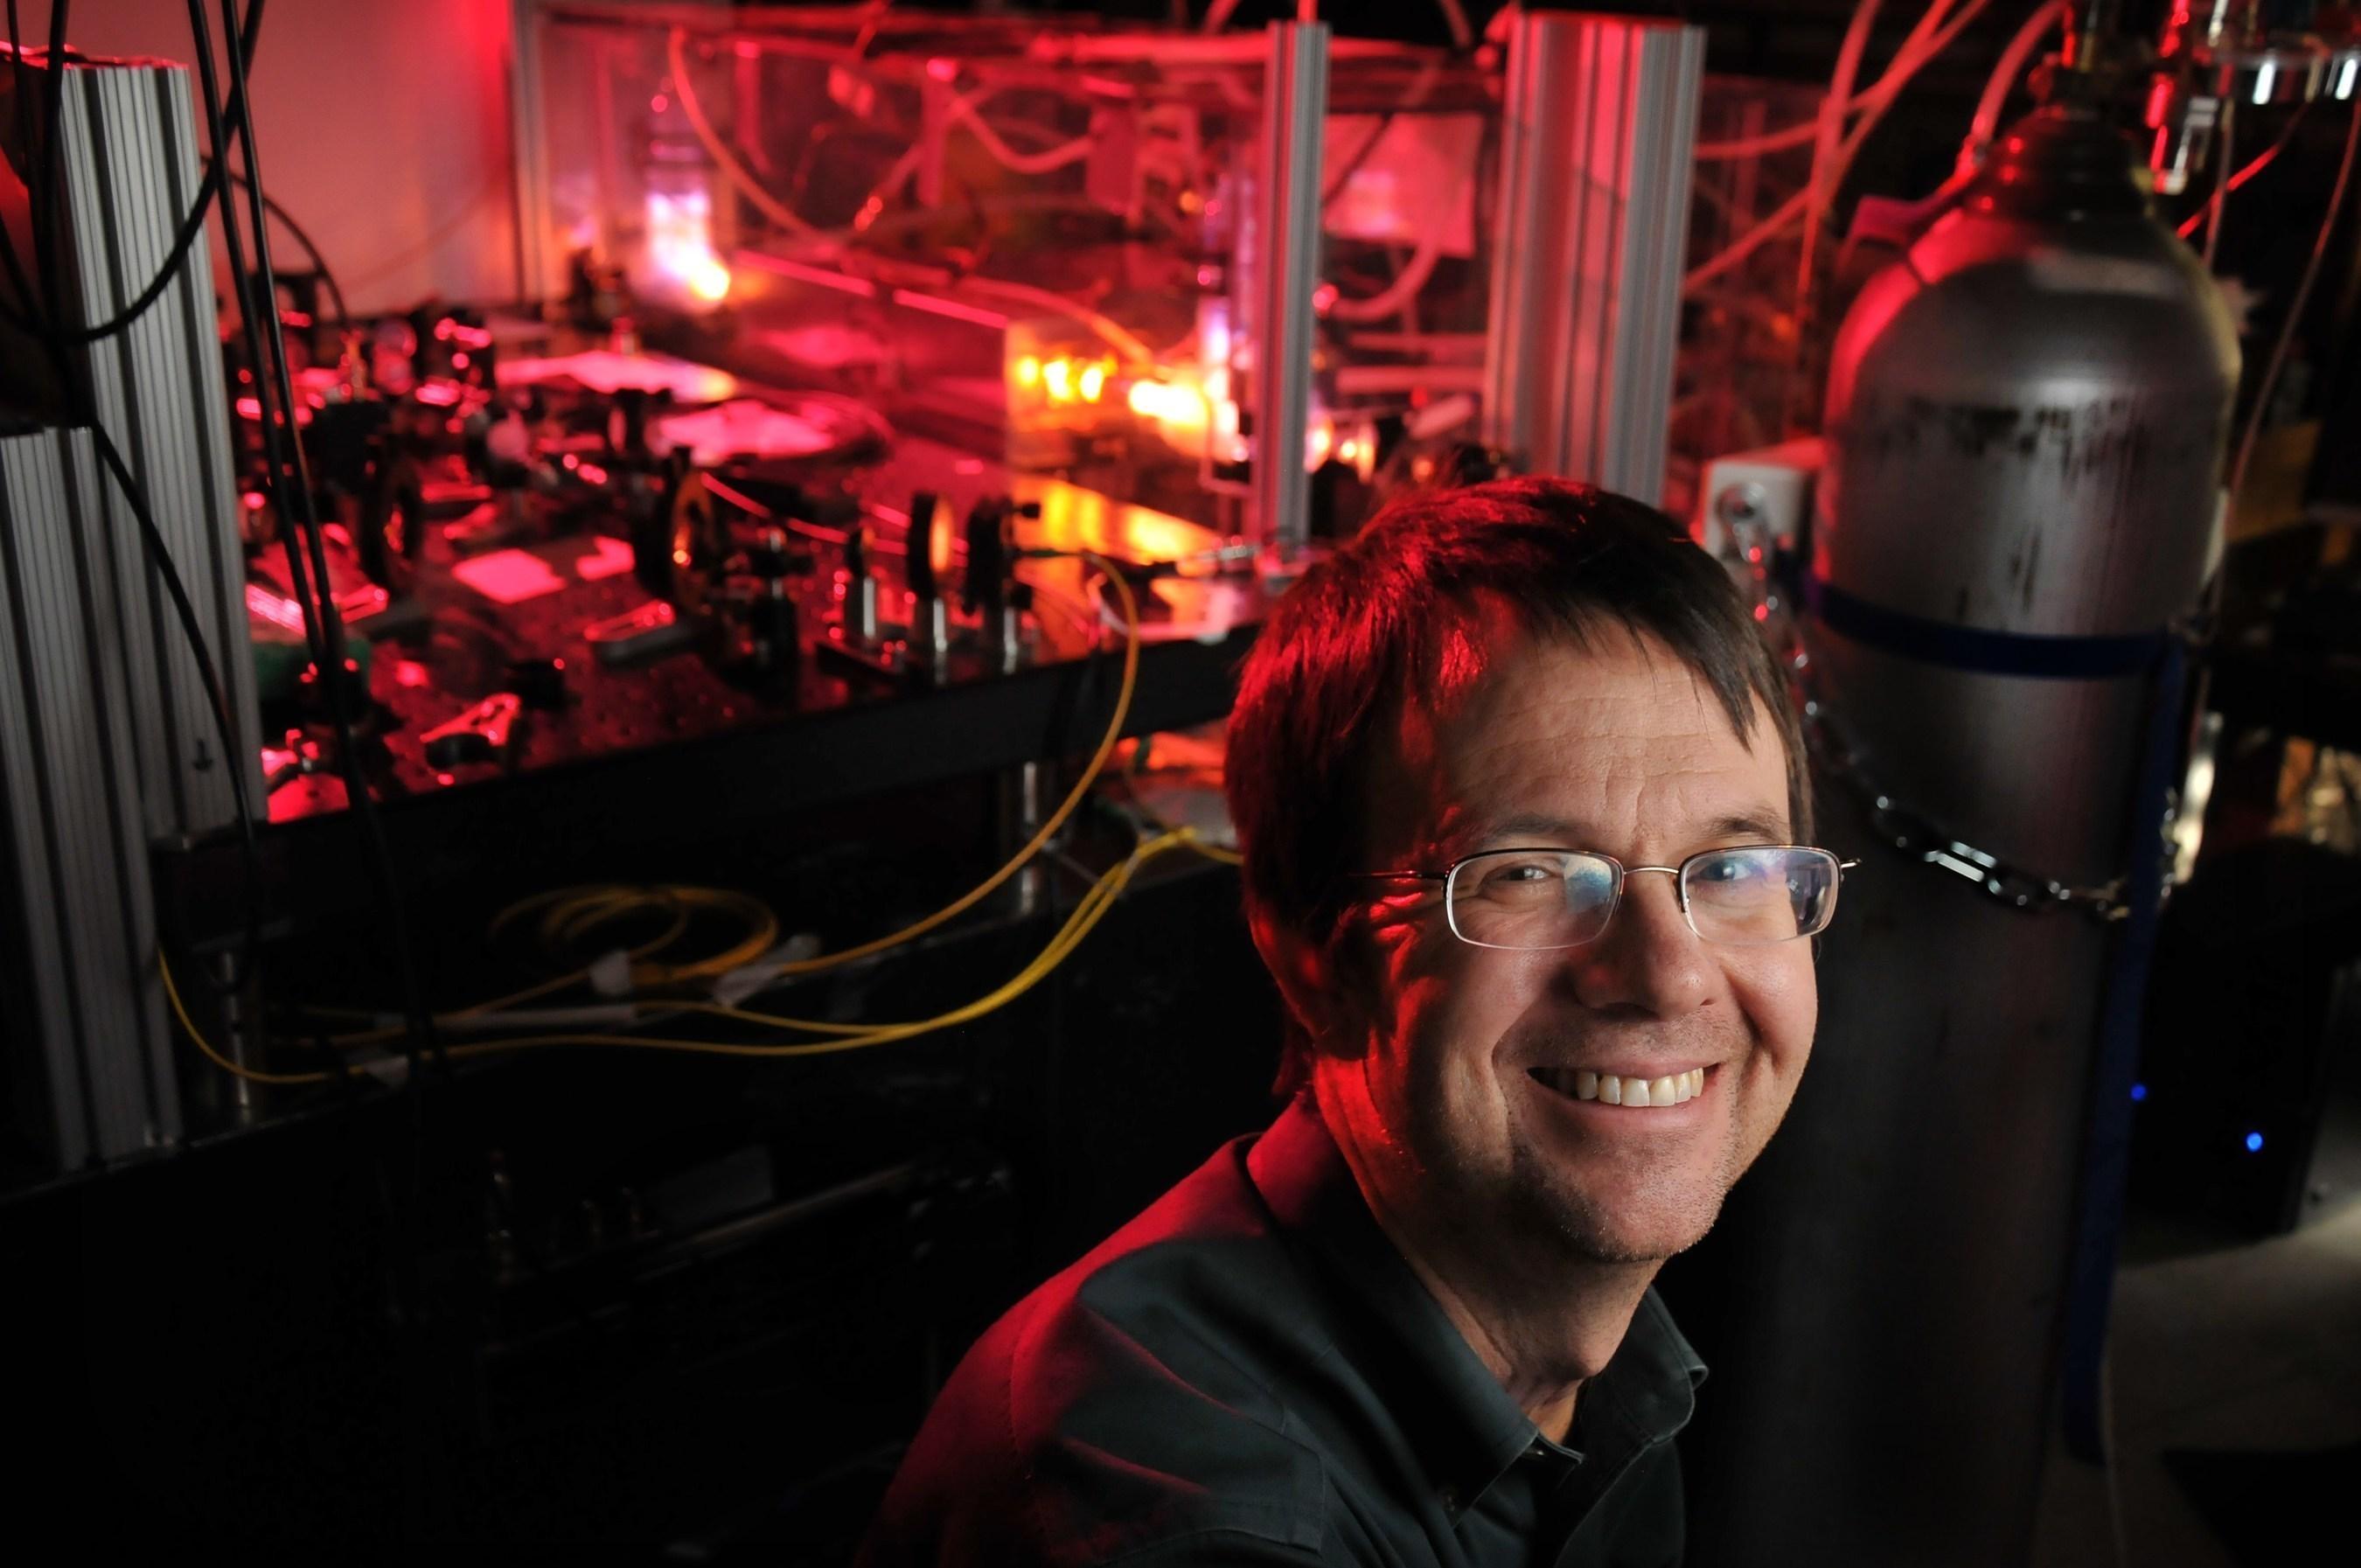 Honeywell Brings Nobel Laureate Eric Cornell To Universitatea Politehnica Bucuresti To Inspire Students To Pursue Science And Engineering